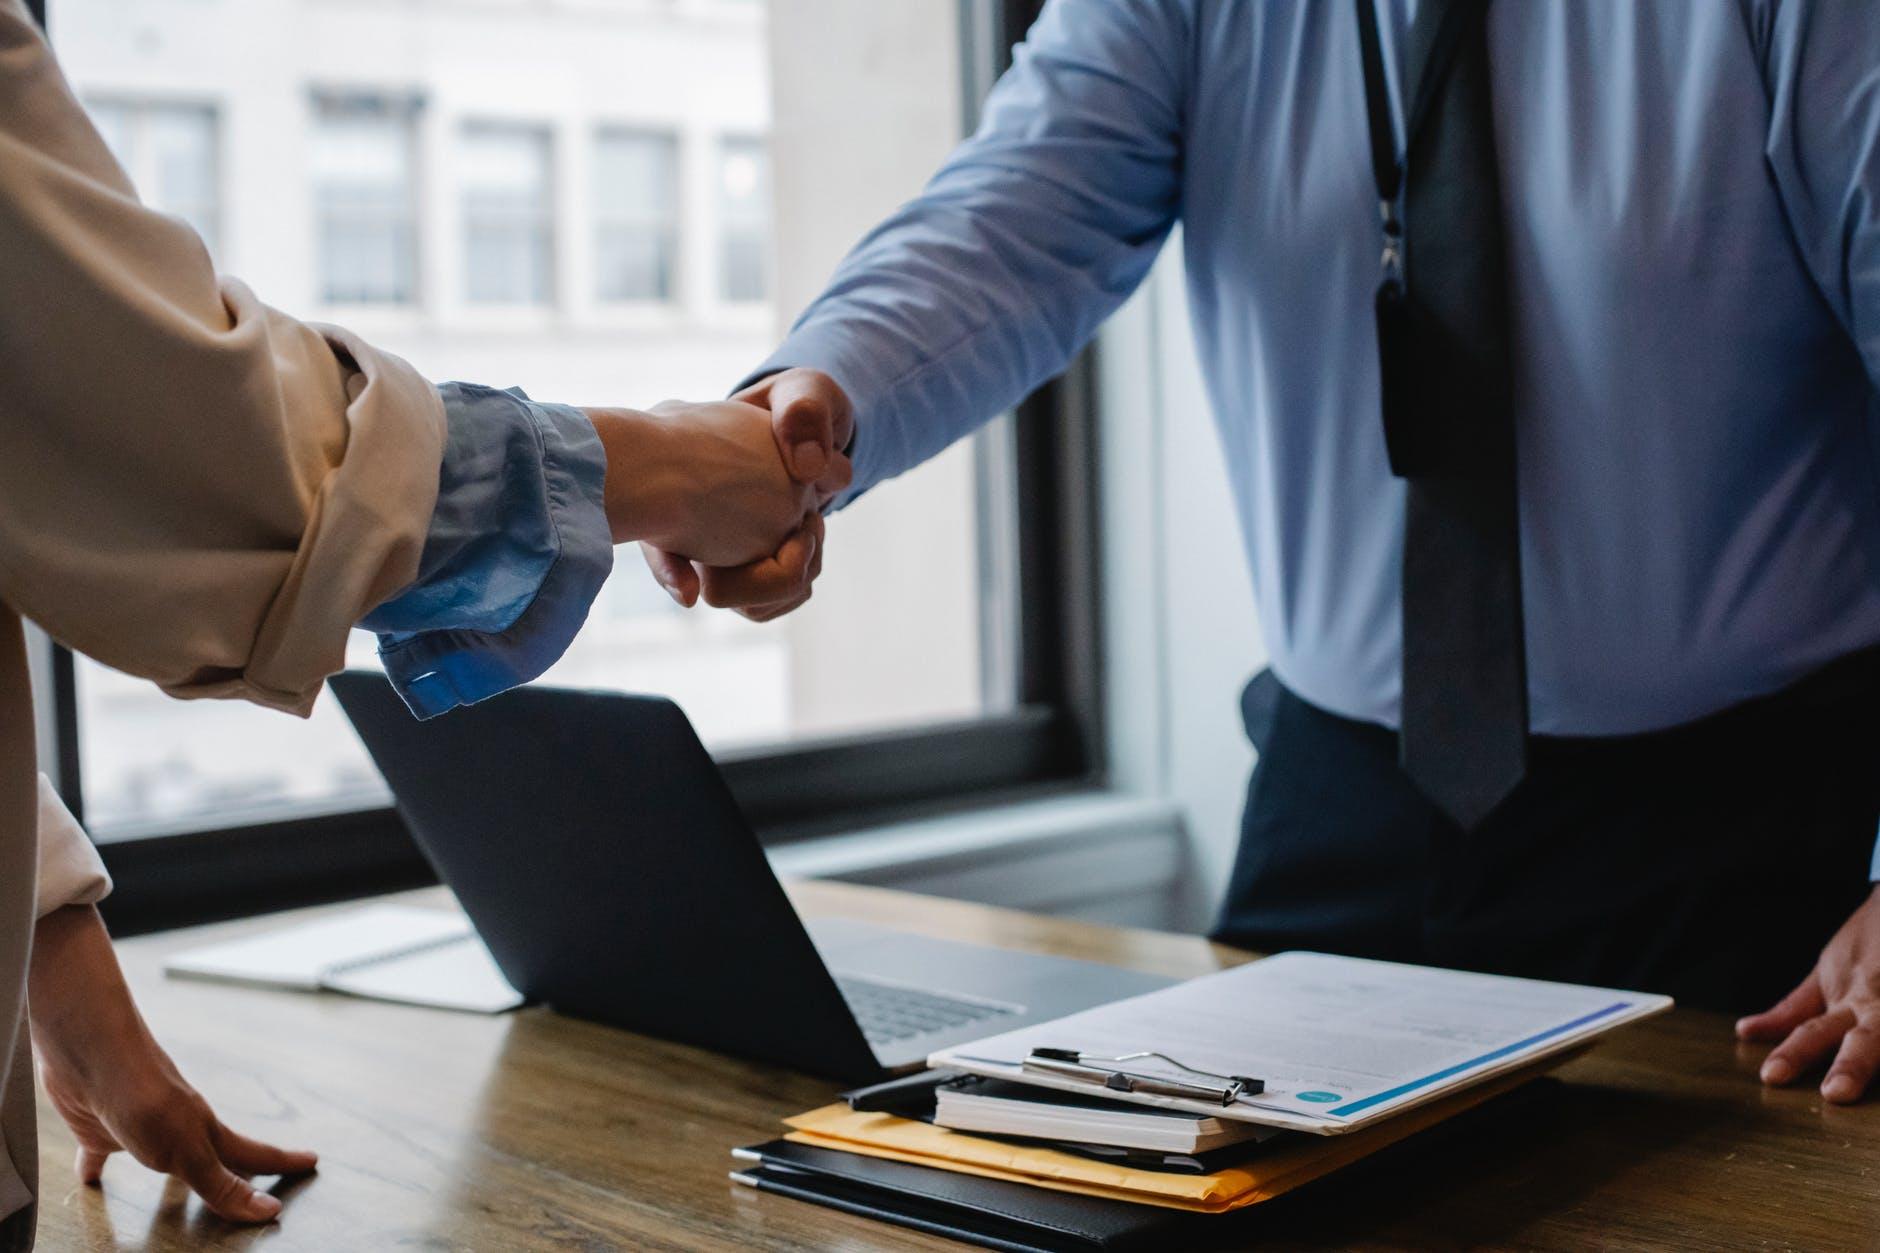 Contractul de imprumut - ce trebuie sa cunosti inainte sa-l semnezi?